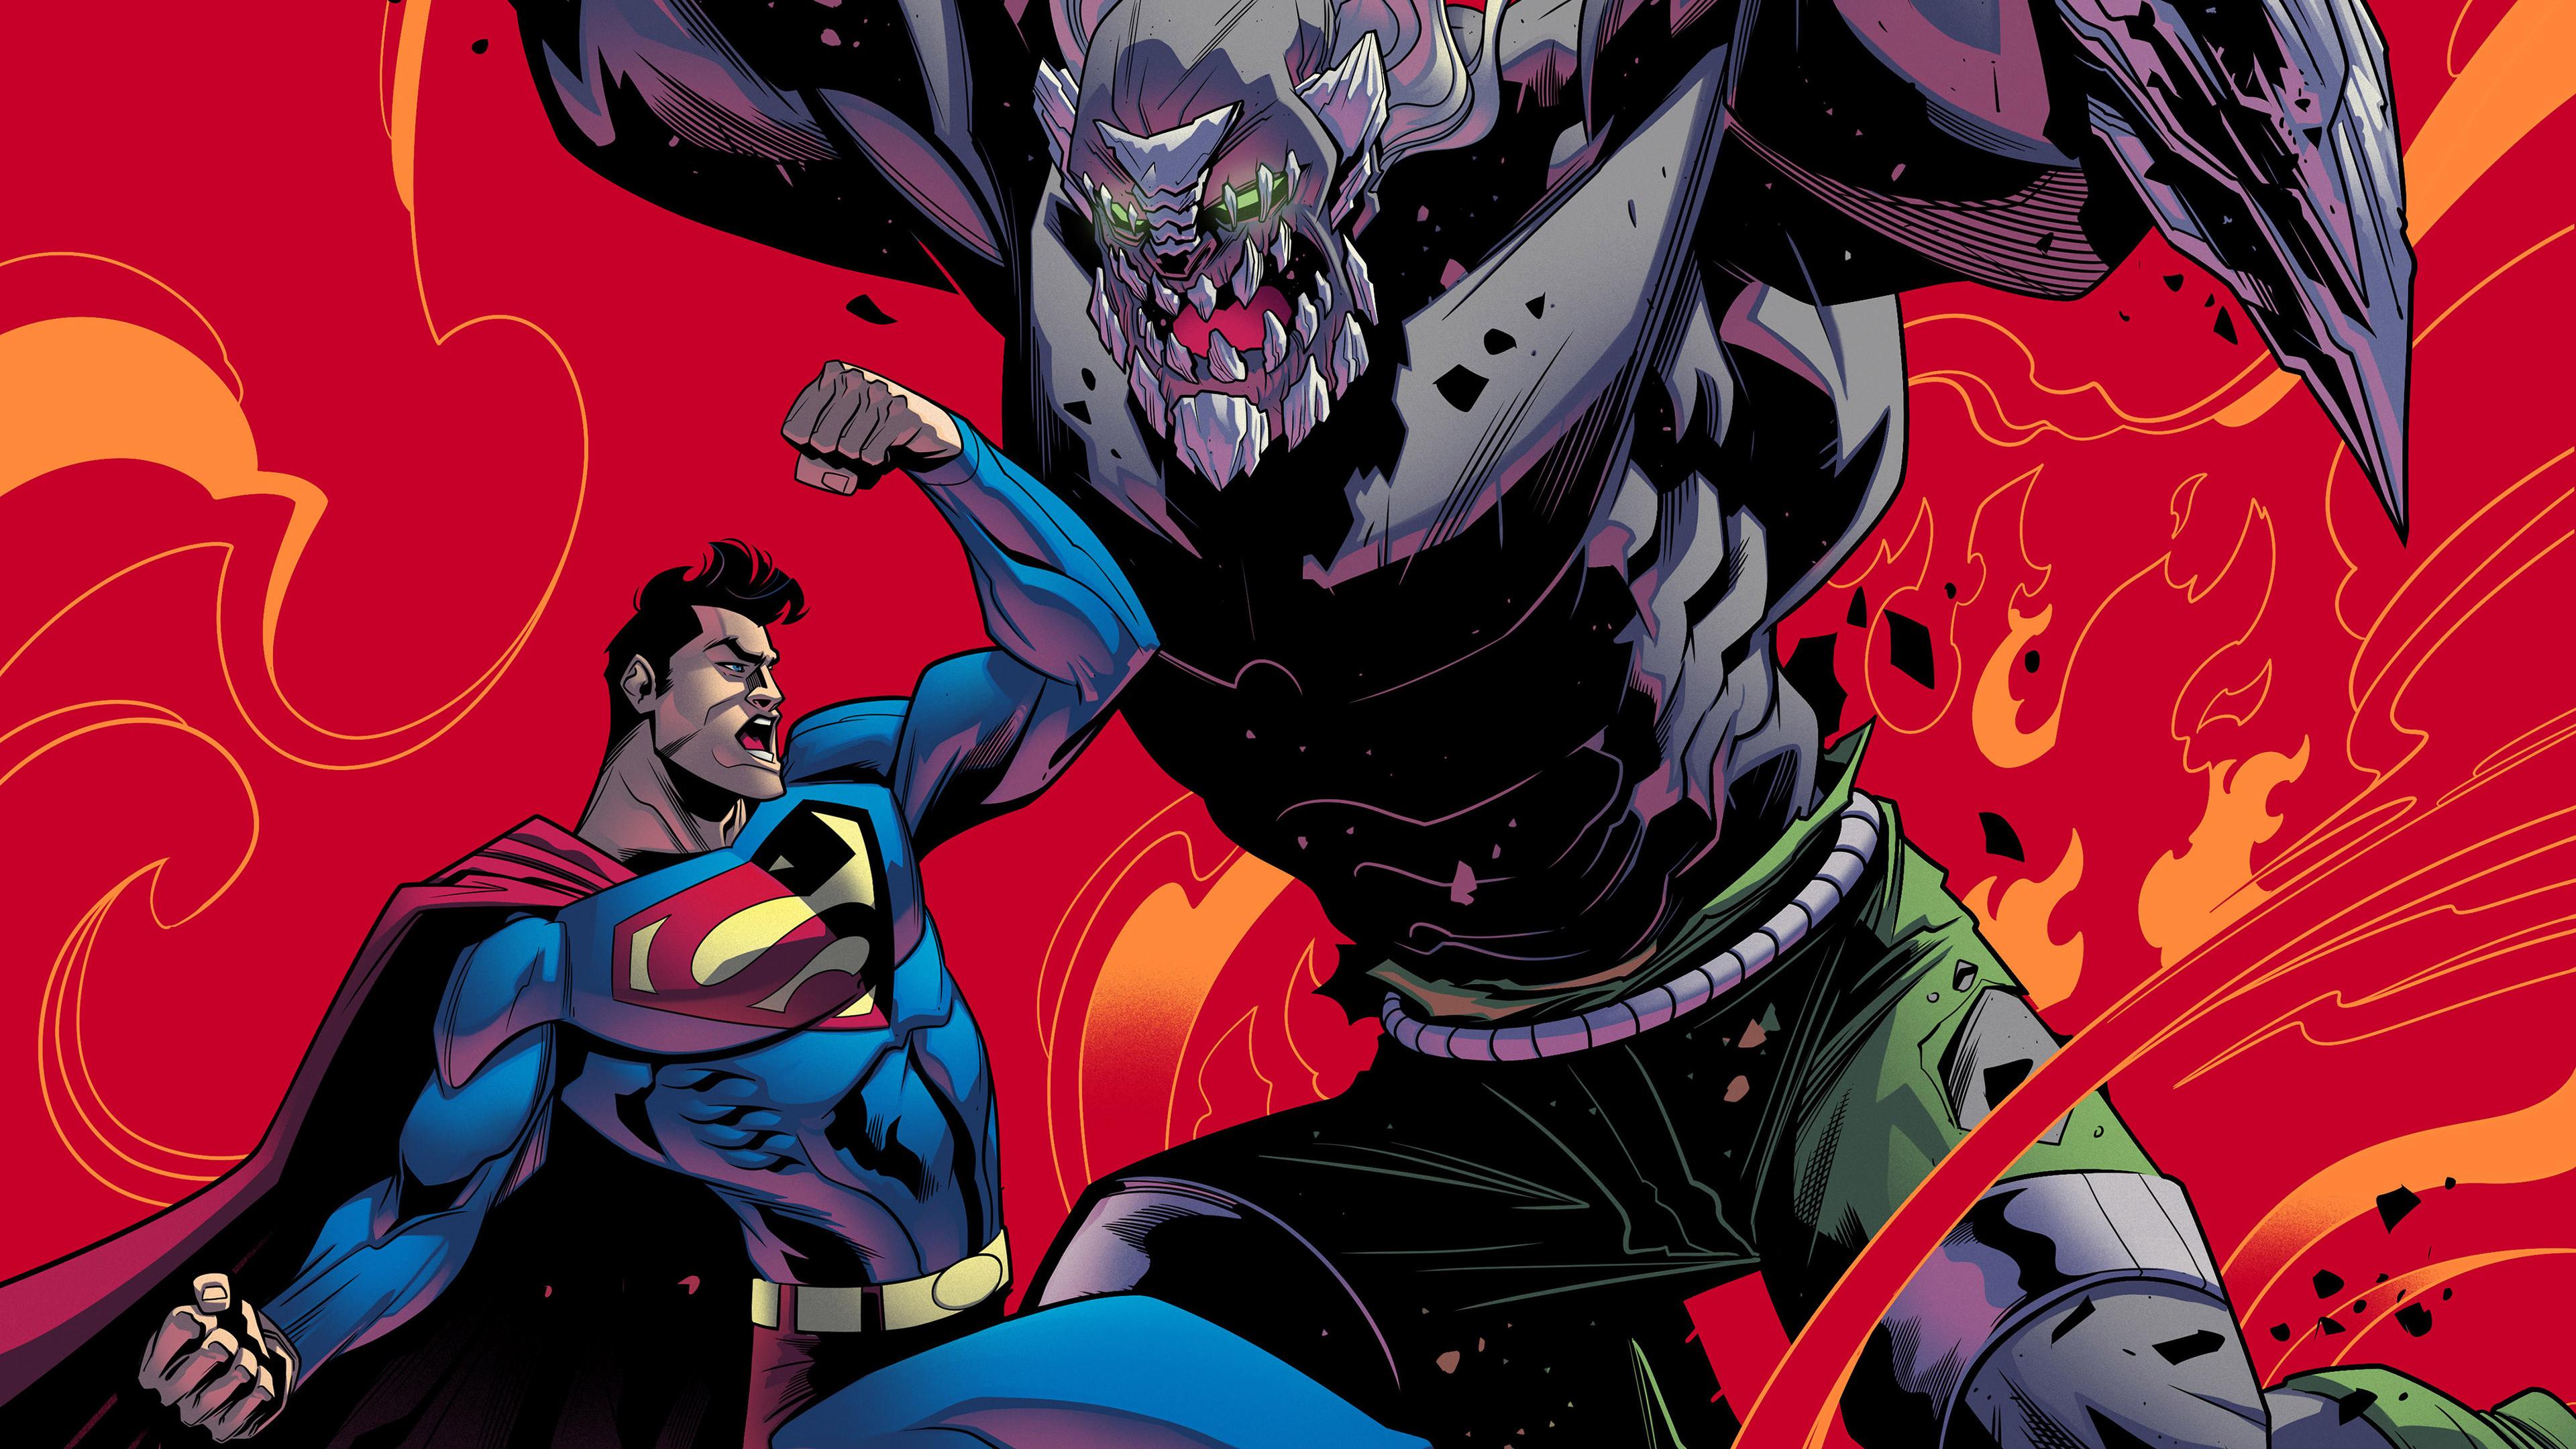 superman vs doomsday 4k 1539978567 - Superman Vs Doomsday 4k - superman wallpapers, superheroes wallpapers, hd-wallpapers, doomsday wallpapers, behance wallpapers, 4k-wallpapers